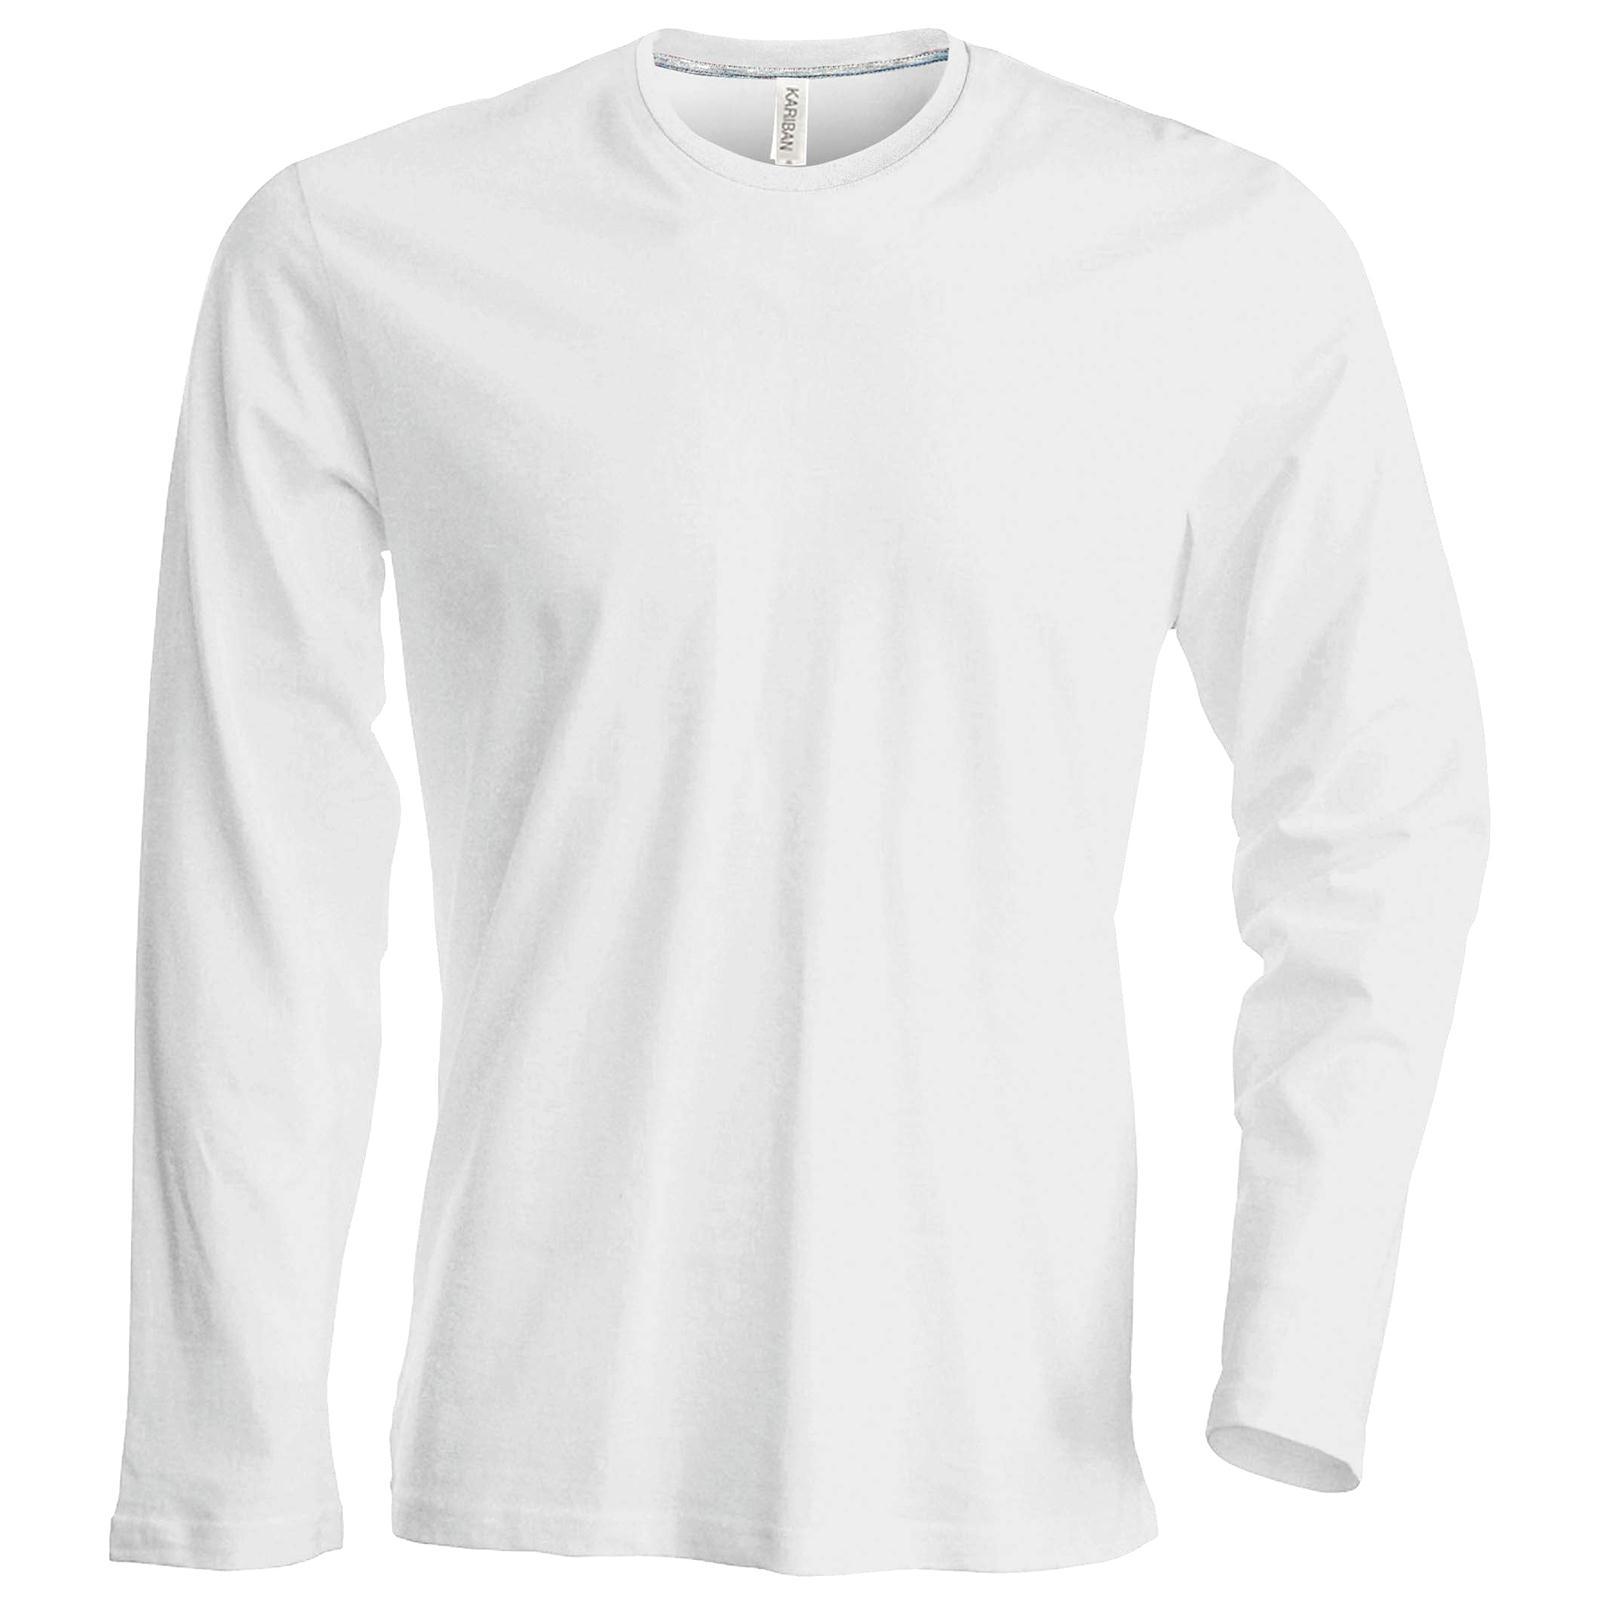 New kariban mens cotton long sleeve slim crew neck t shirt for White cotton long sleeve t shirt